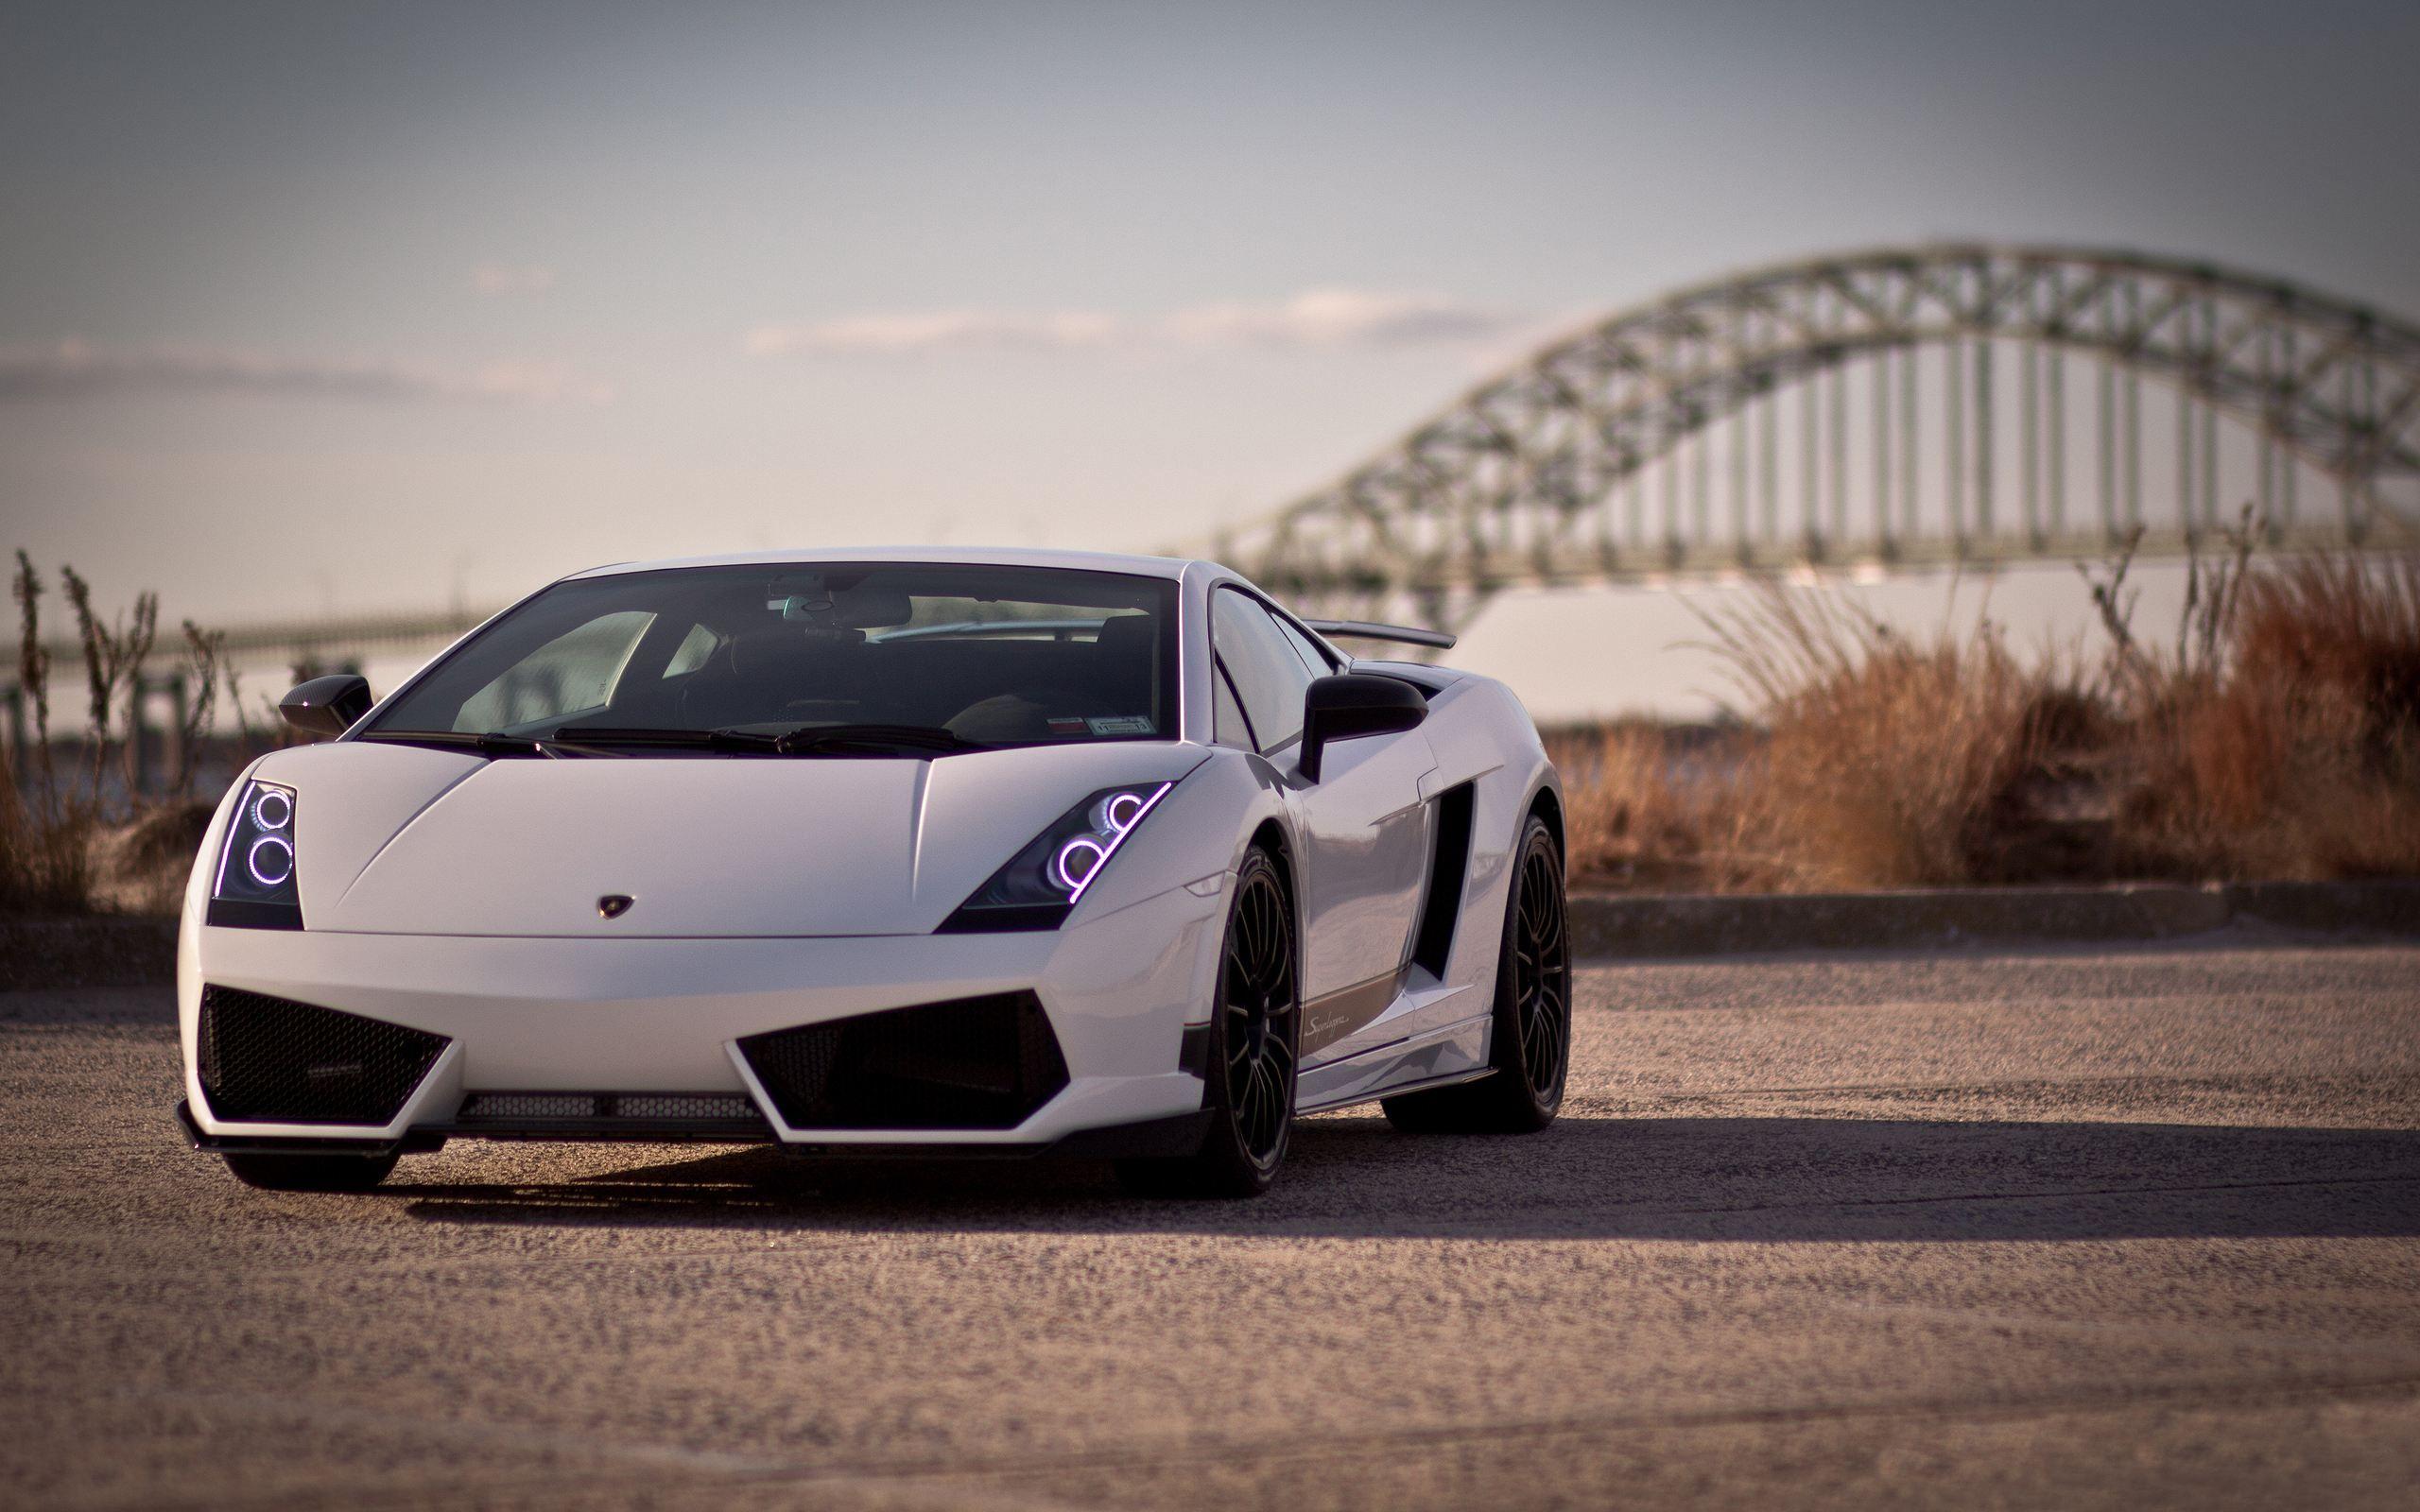 Car Backgrounds Photoshop Lamborghini Gallardo White